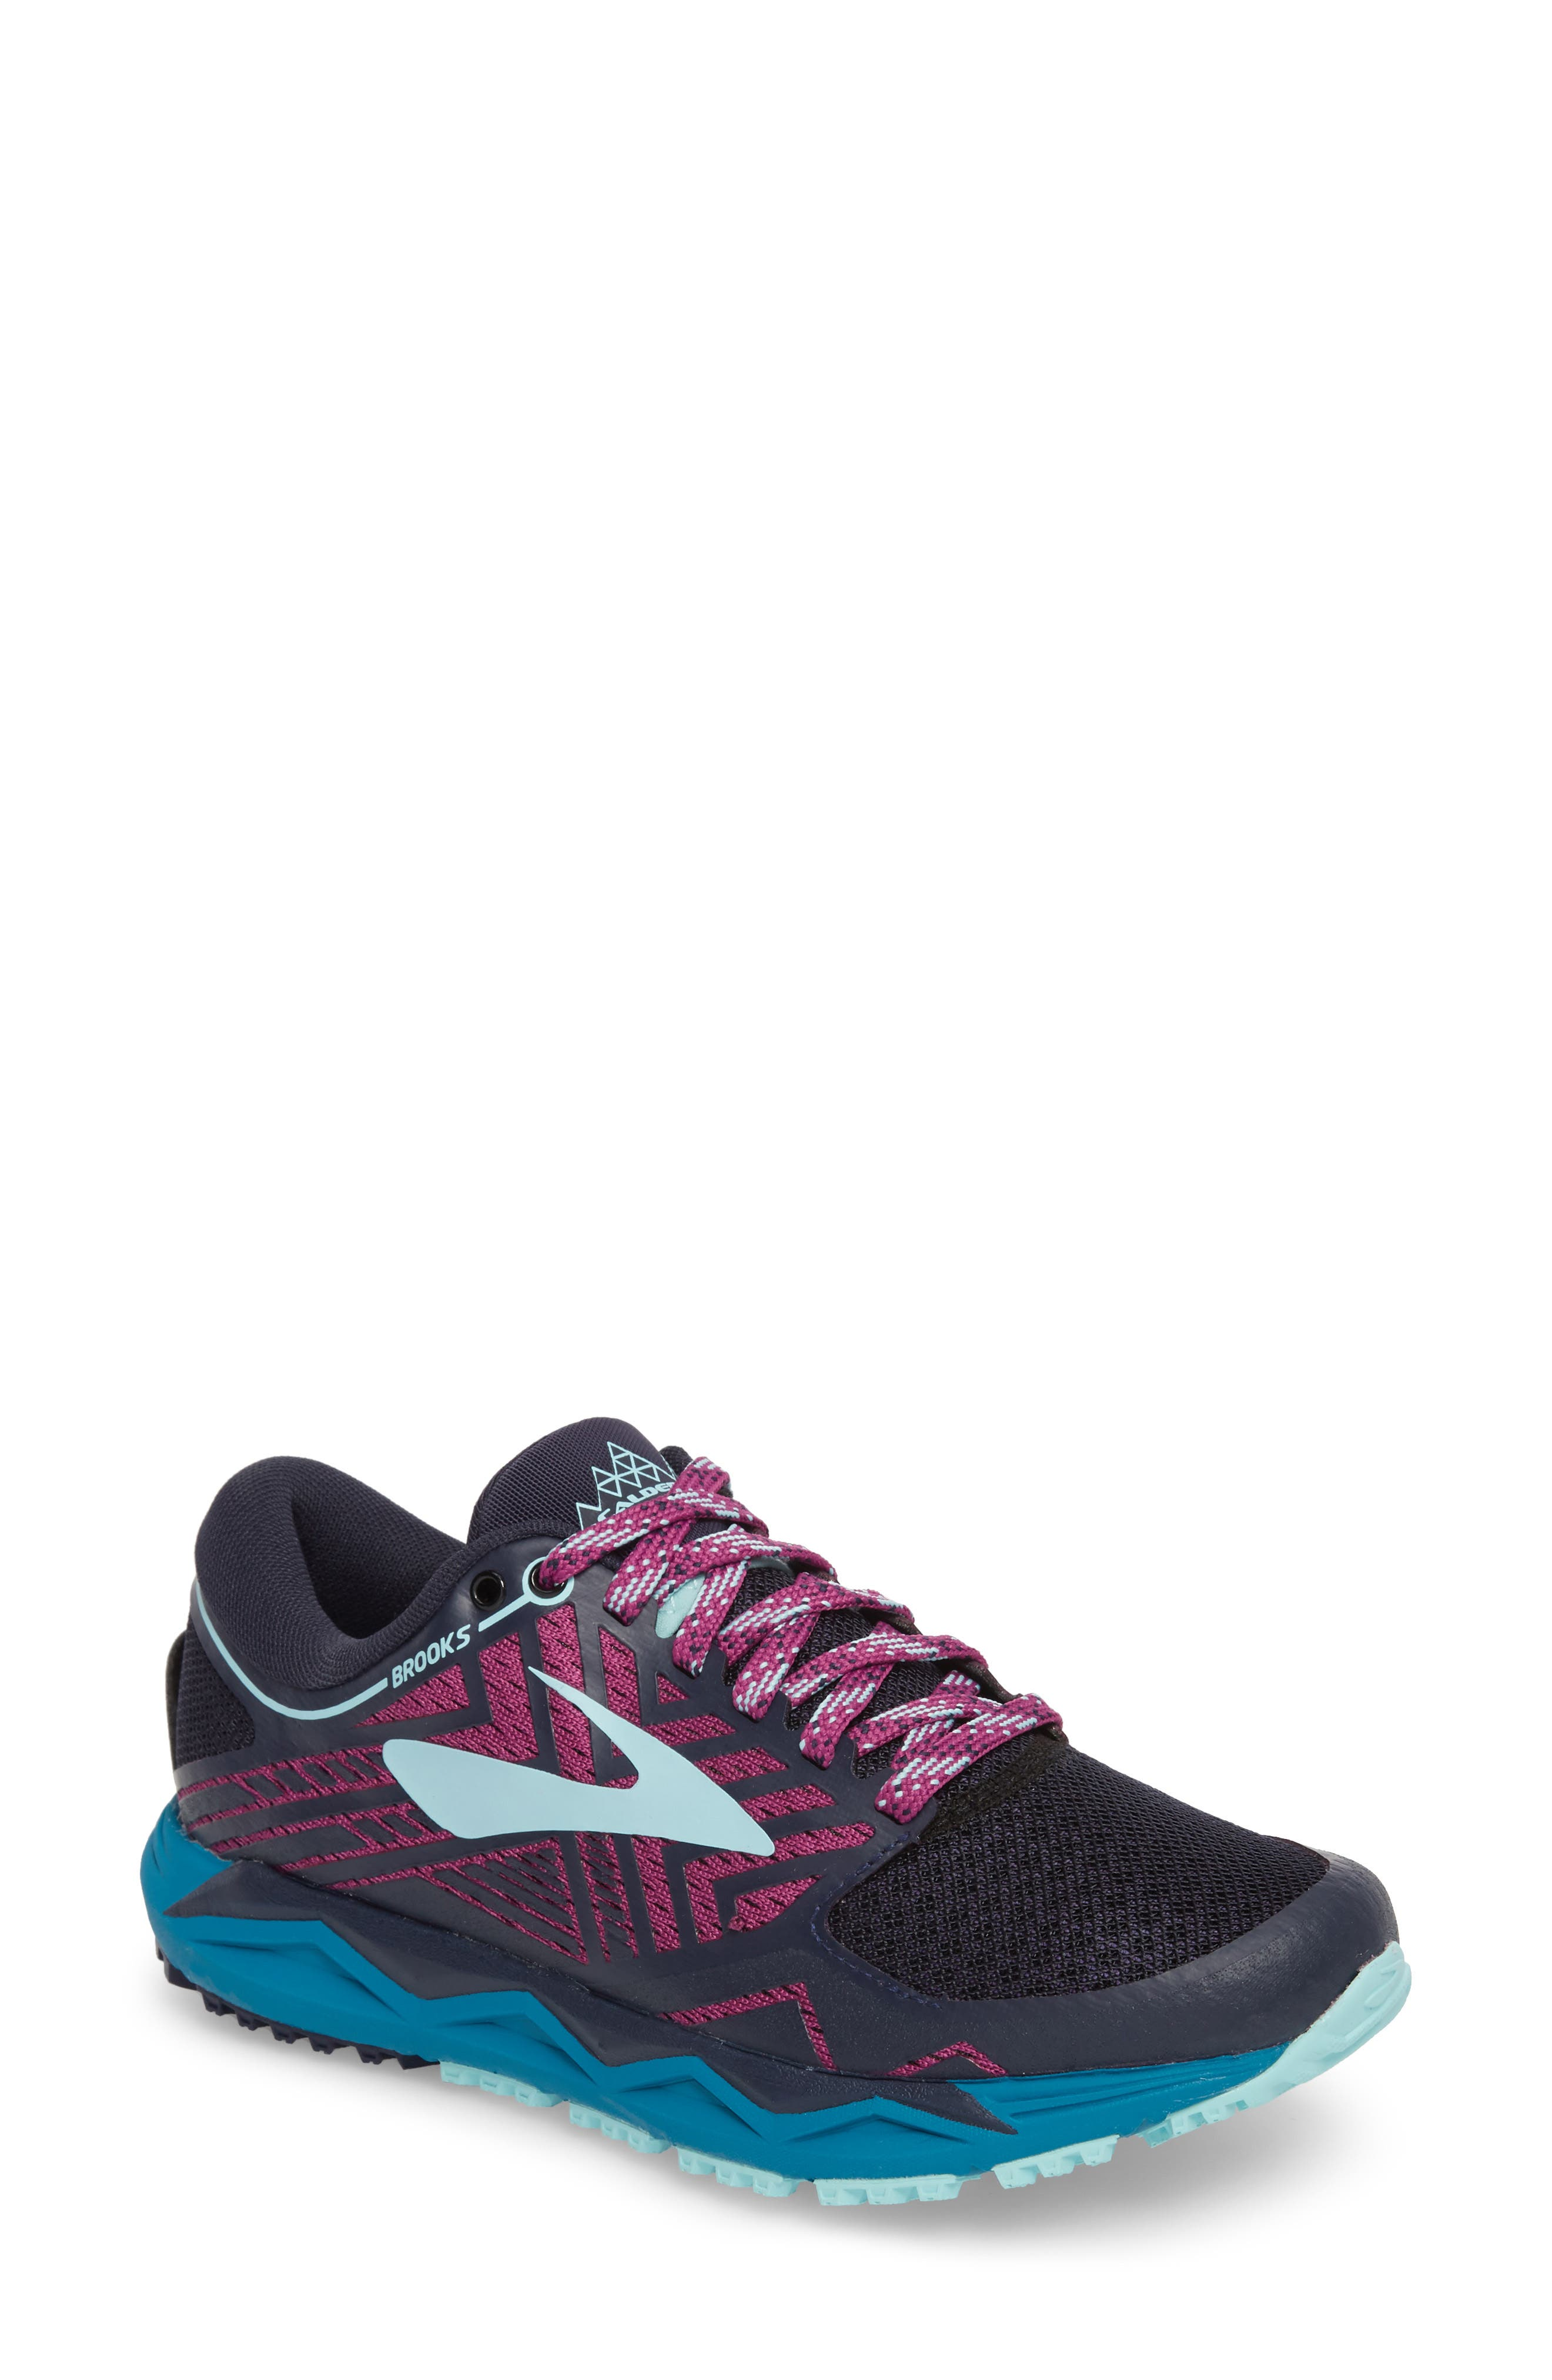 Caldera 2 Trail Running Shoe, Main, color, NAVY/ PLUM/ ICE BLUE